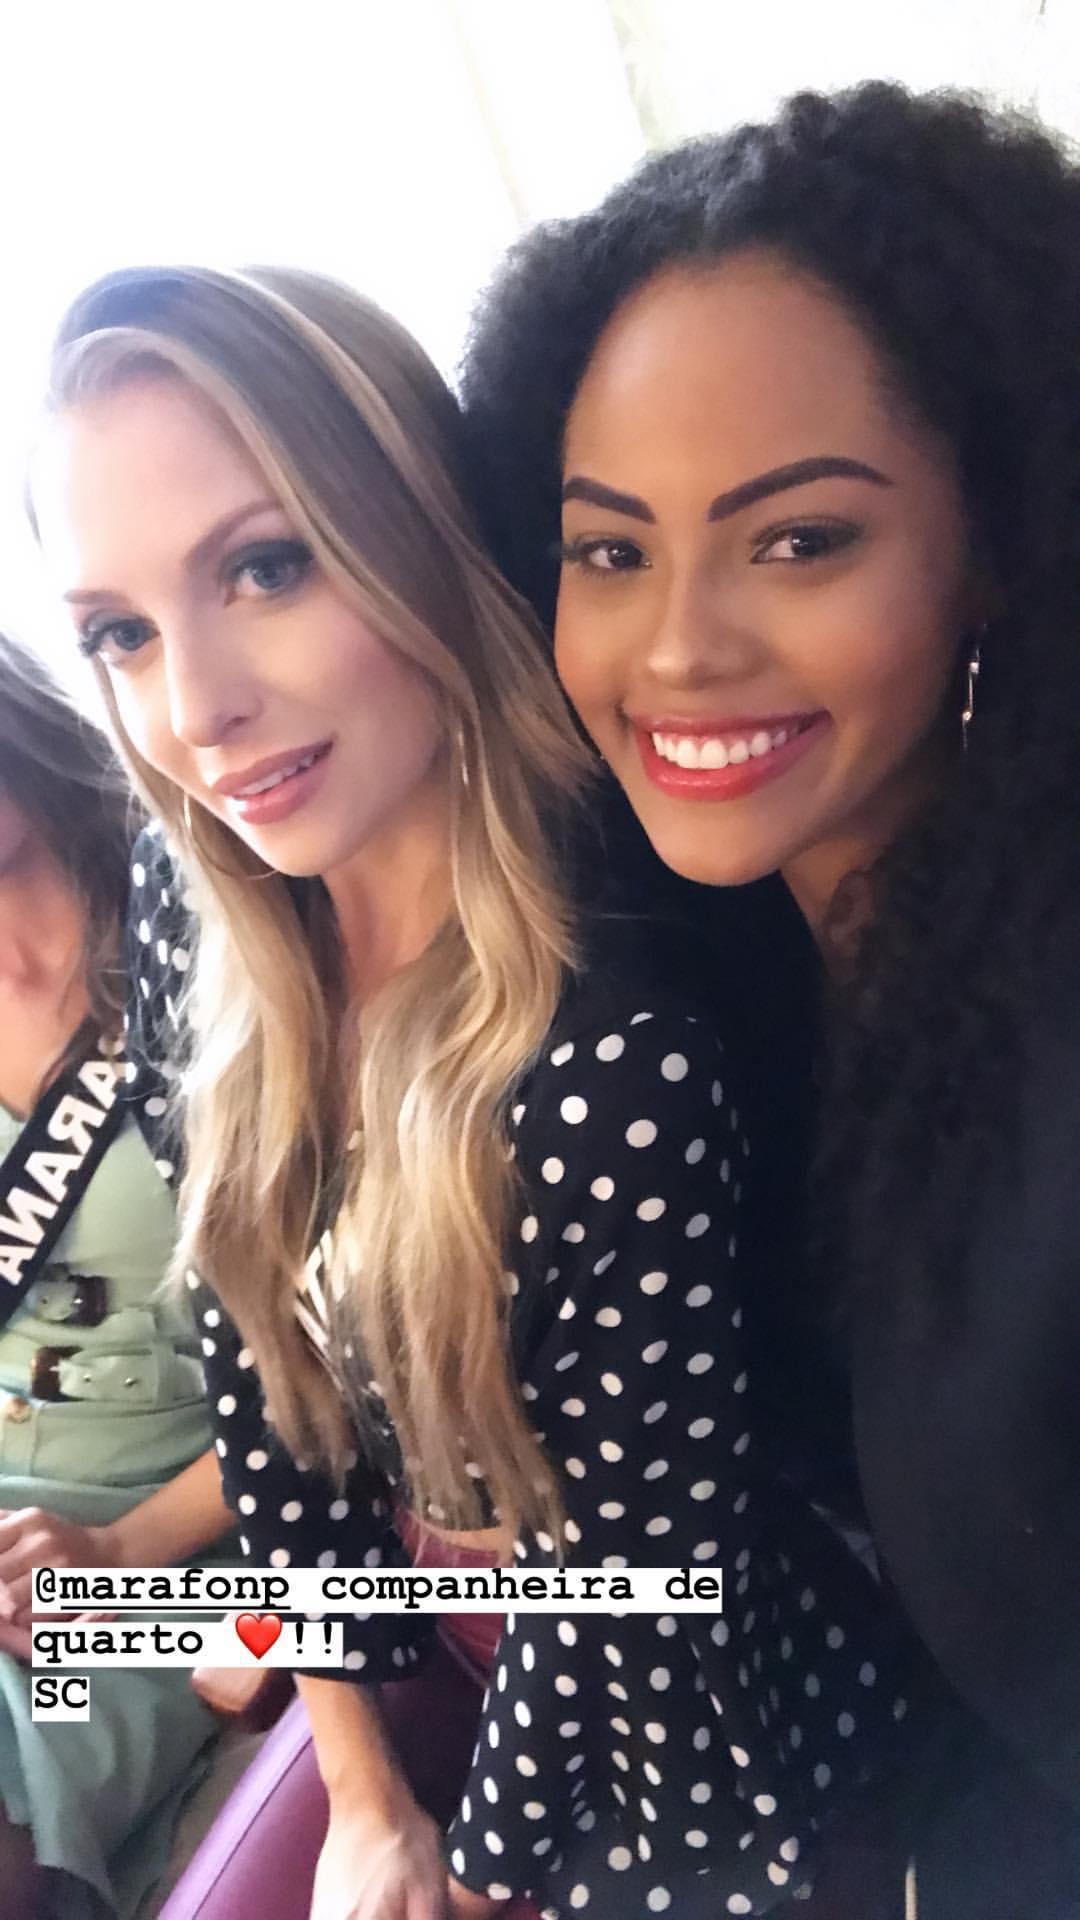 natali vitoria, miss roraima mundo 2020/top 15 de miss brasil universo 2019 /miss brasil teen universe 2017. primeira miss negra a vencer o miss roraima. - Página 9 51736011